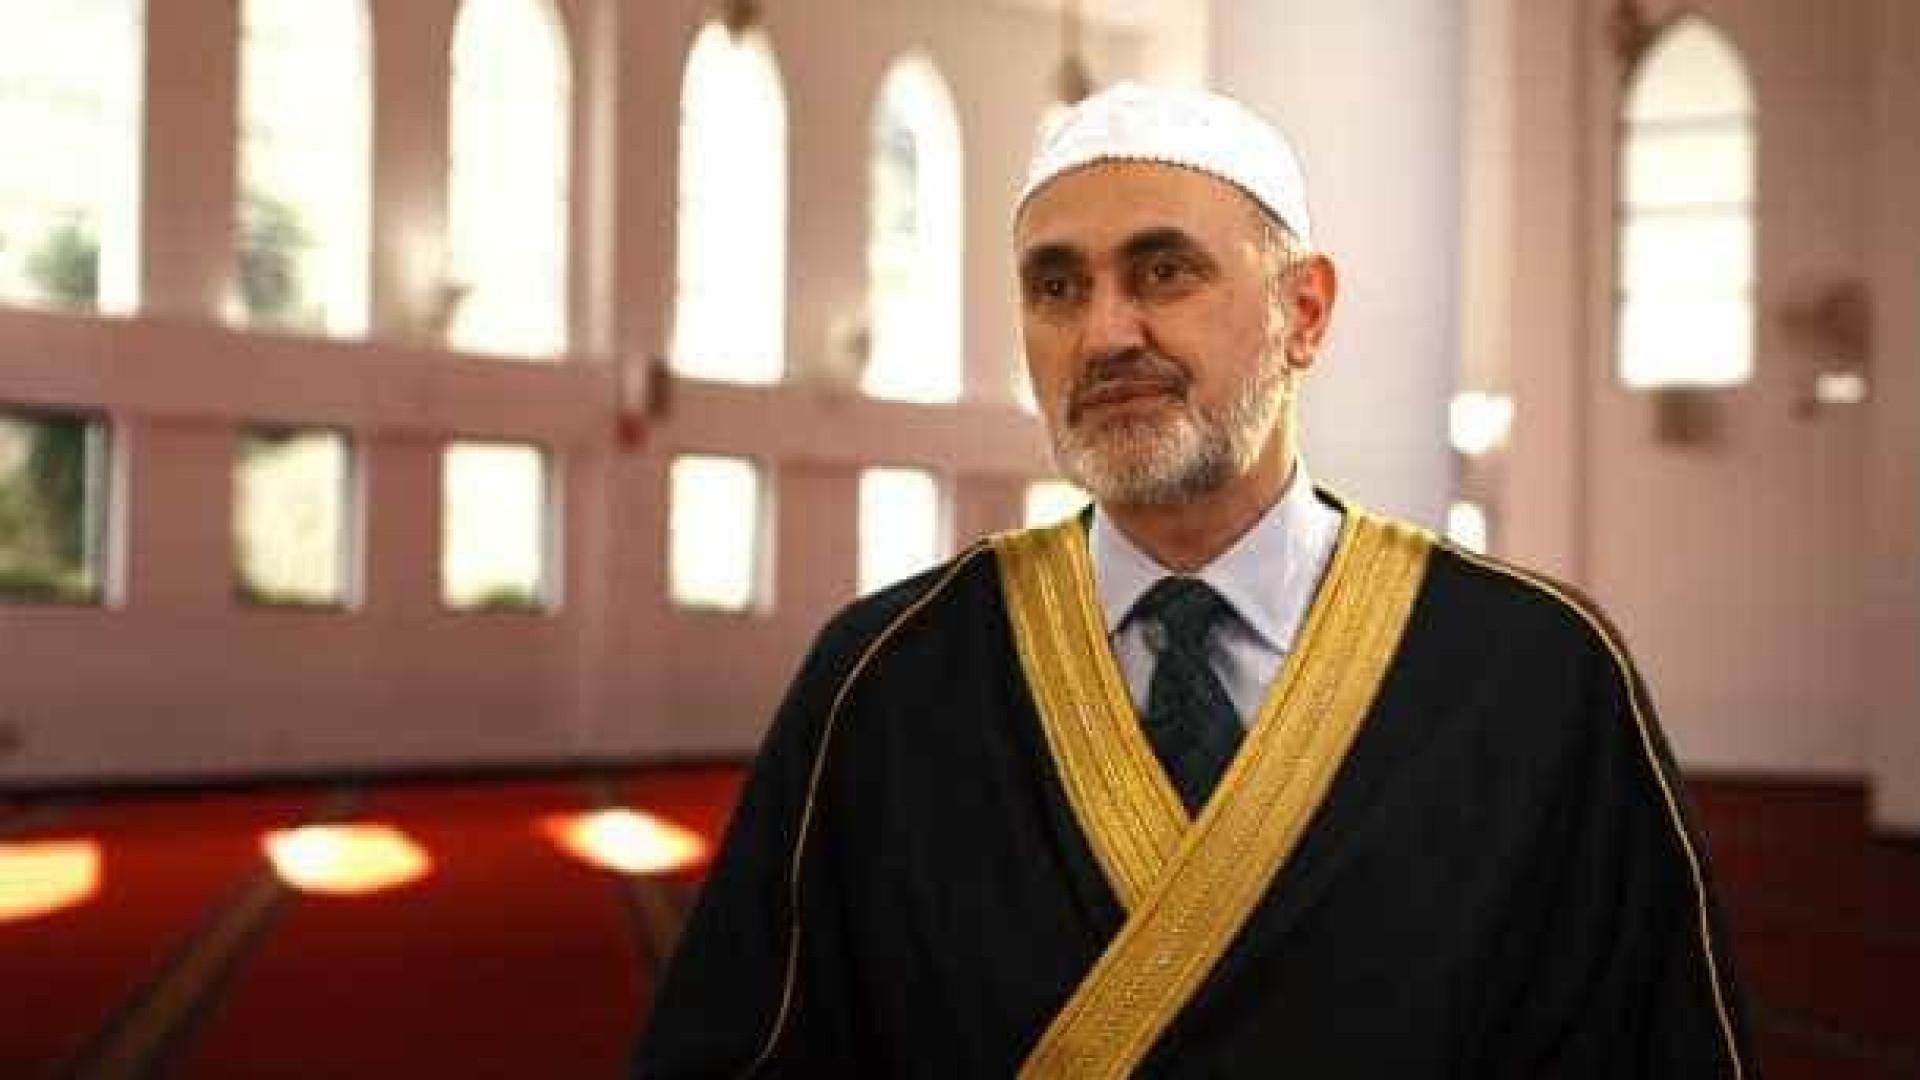 Líder islâmico no Brasil critica prisões de suspeitos de terrorismo